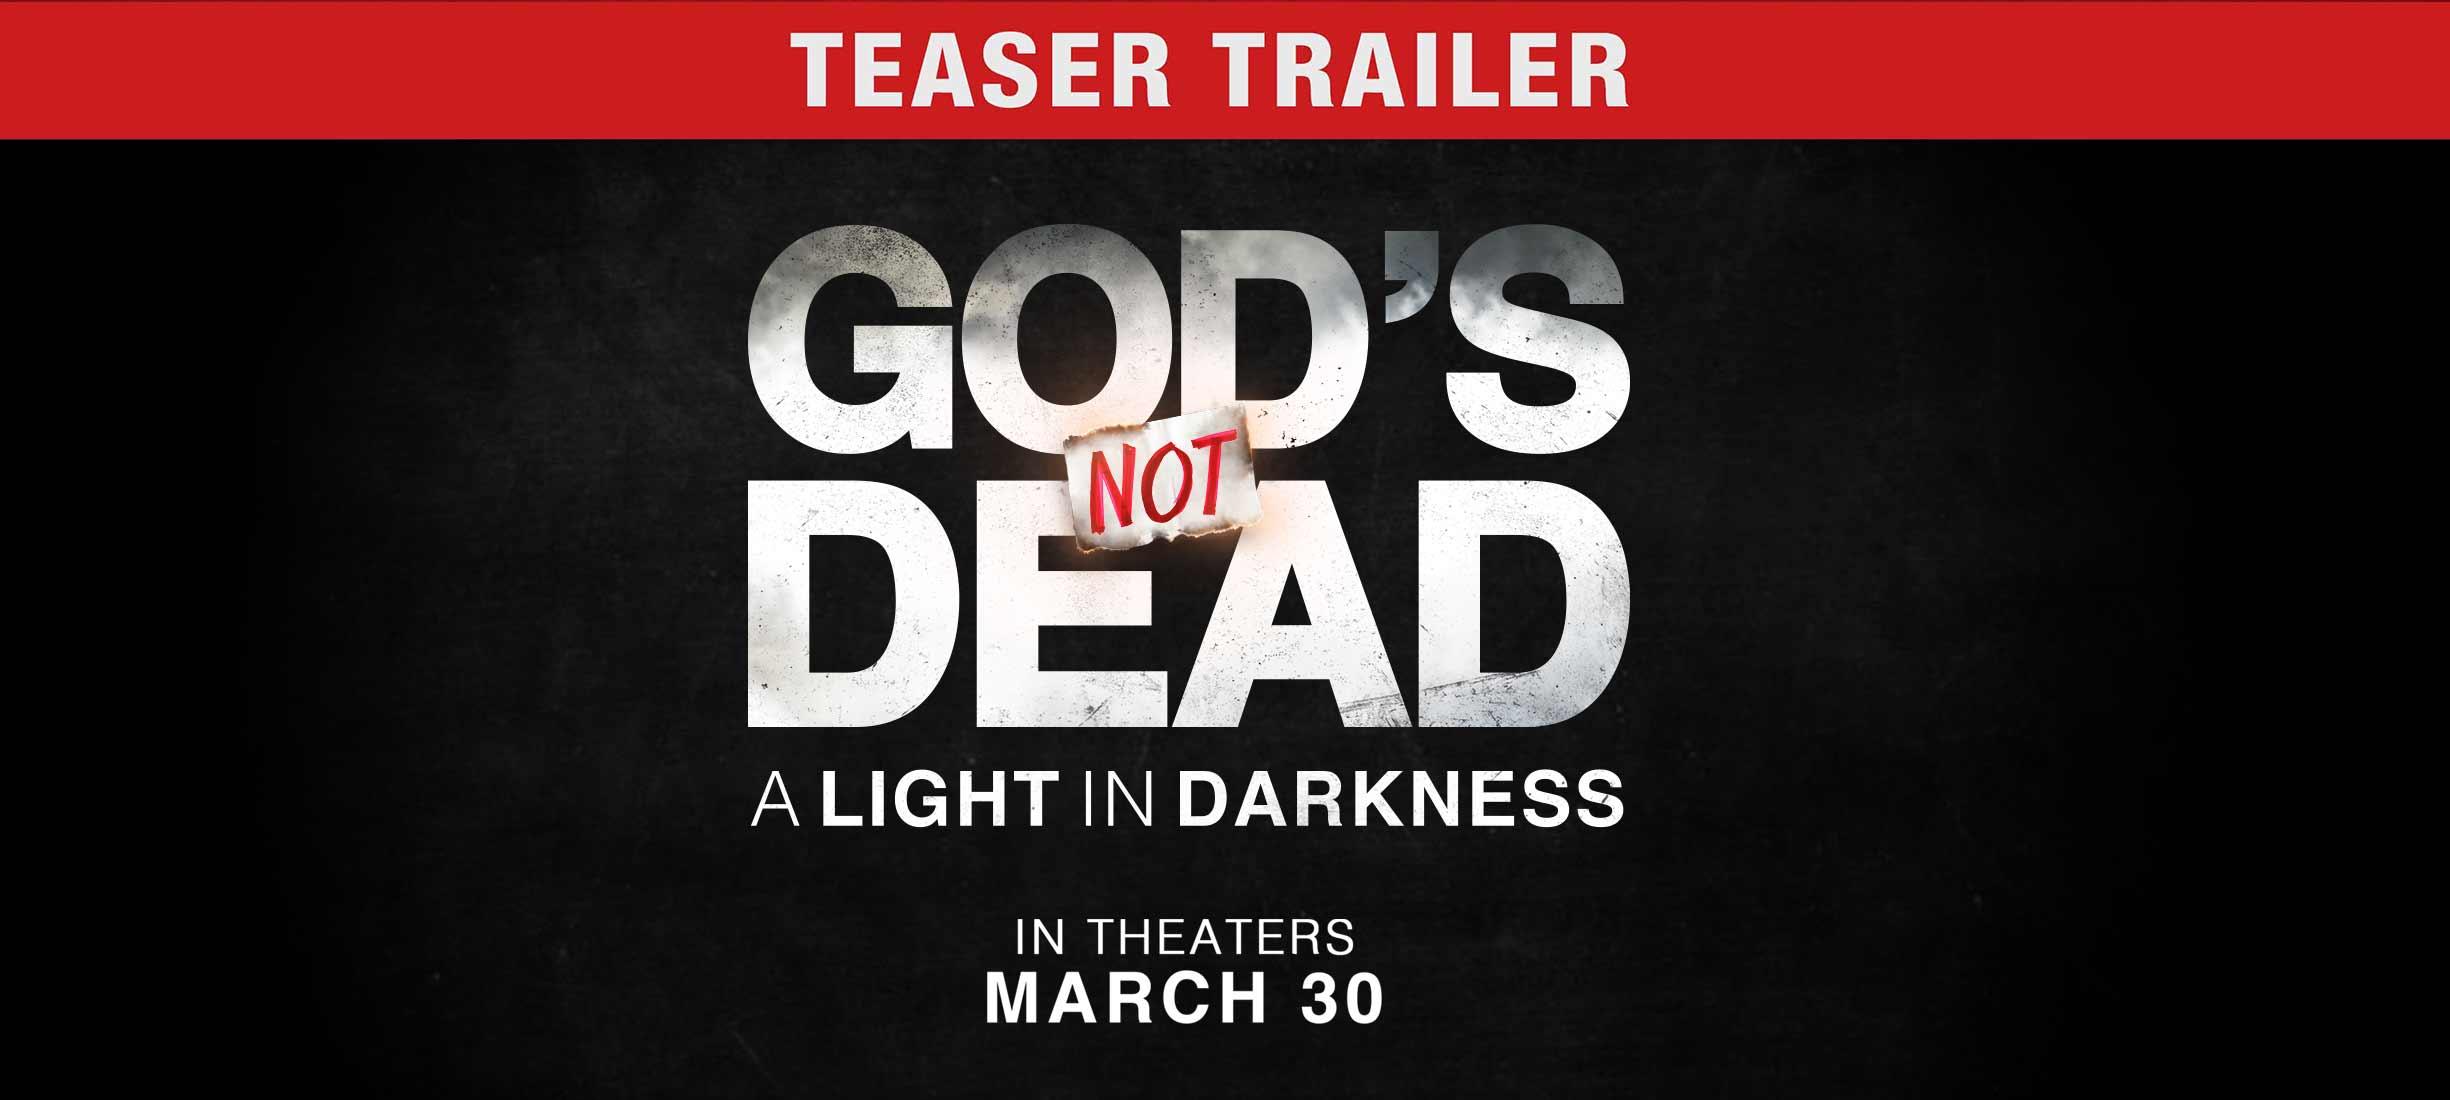 God's Not Dead: A Light in Darkness - Trailer